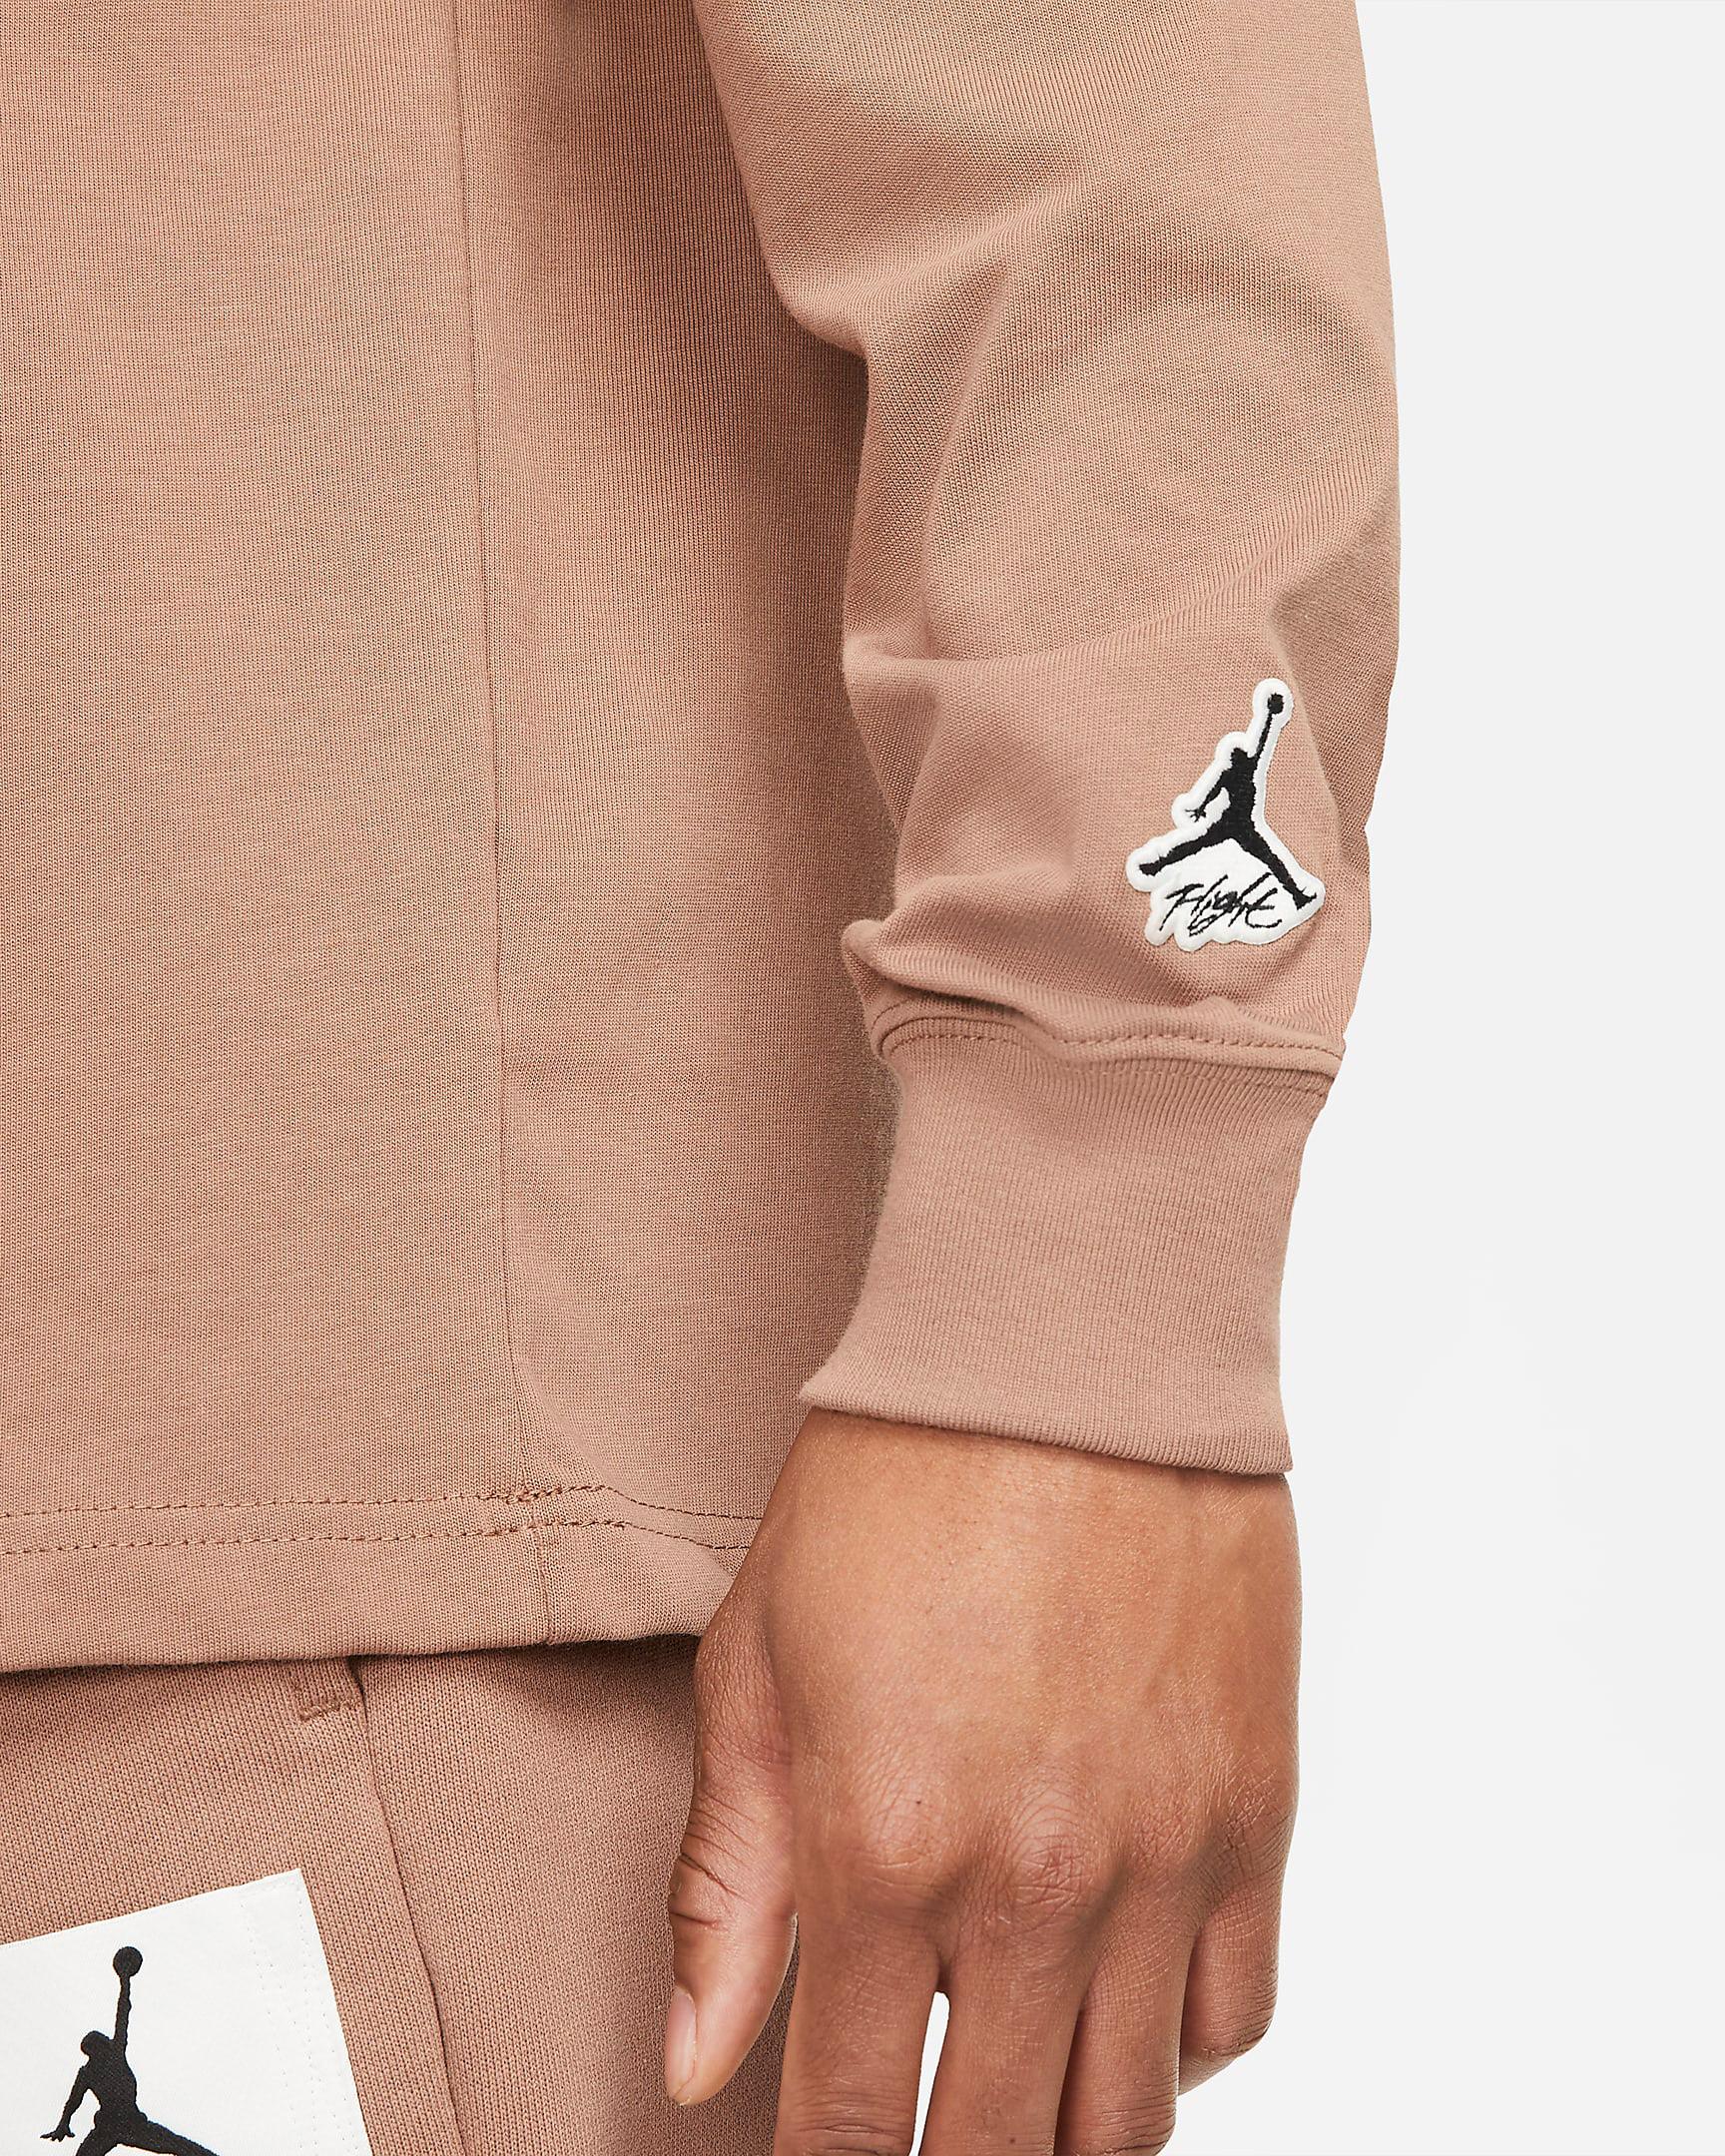 jordan-archaeo-brown-long-sleeve-shirt-3